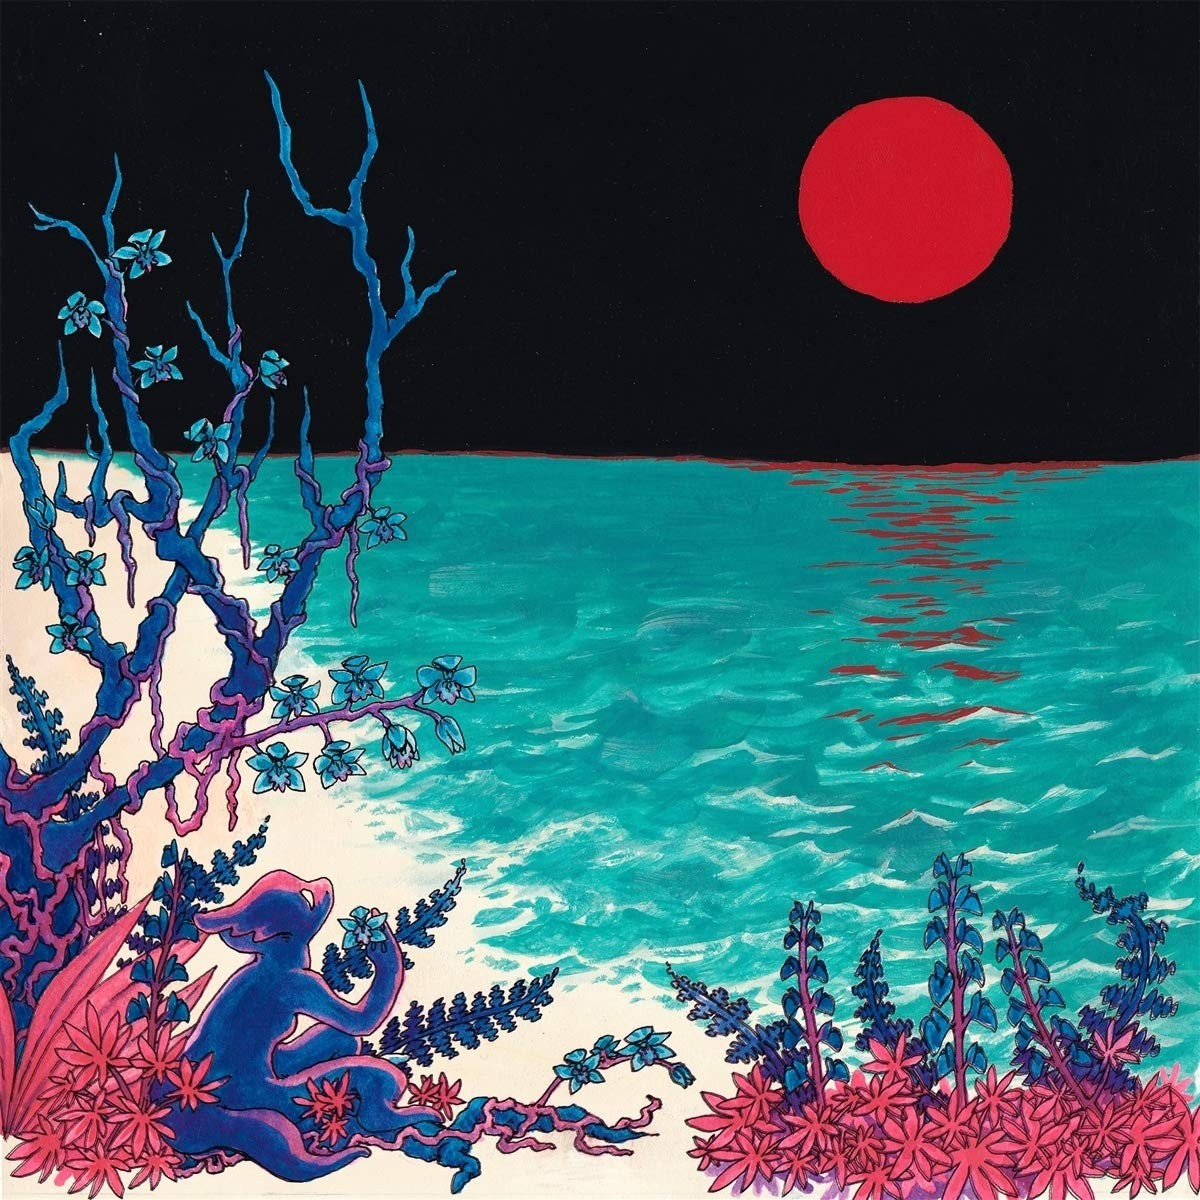 Glass Beach - the first glass beach album (Colored) 2XLP